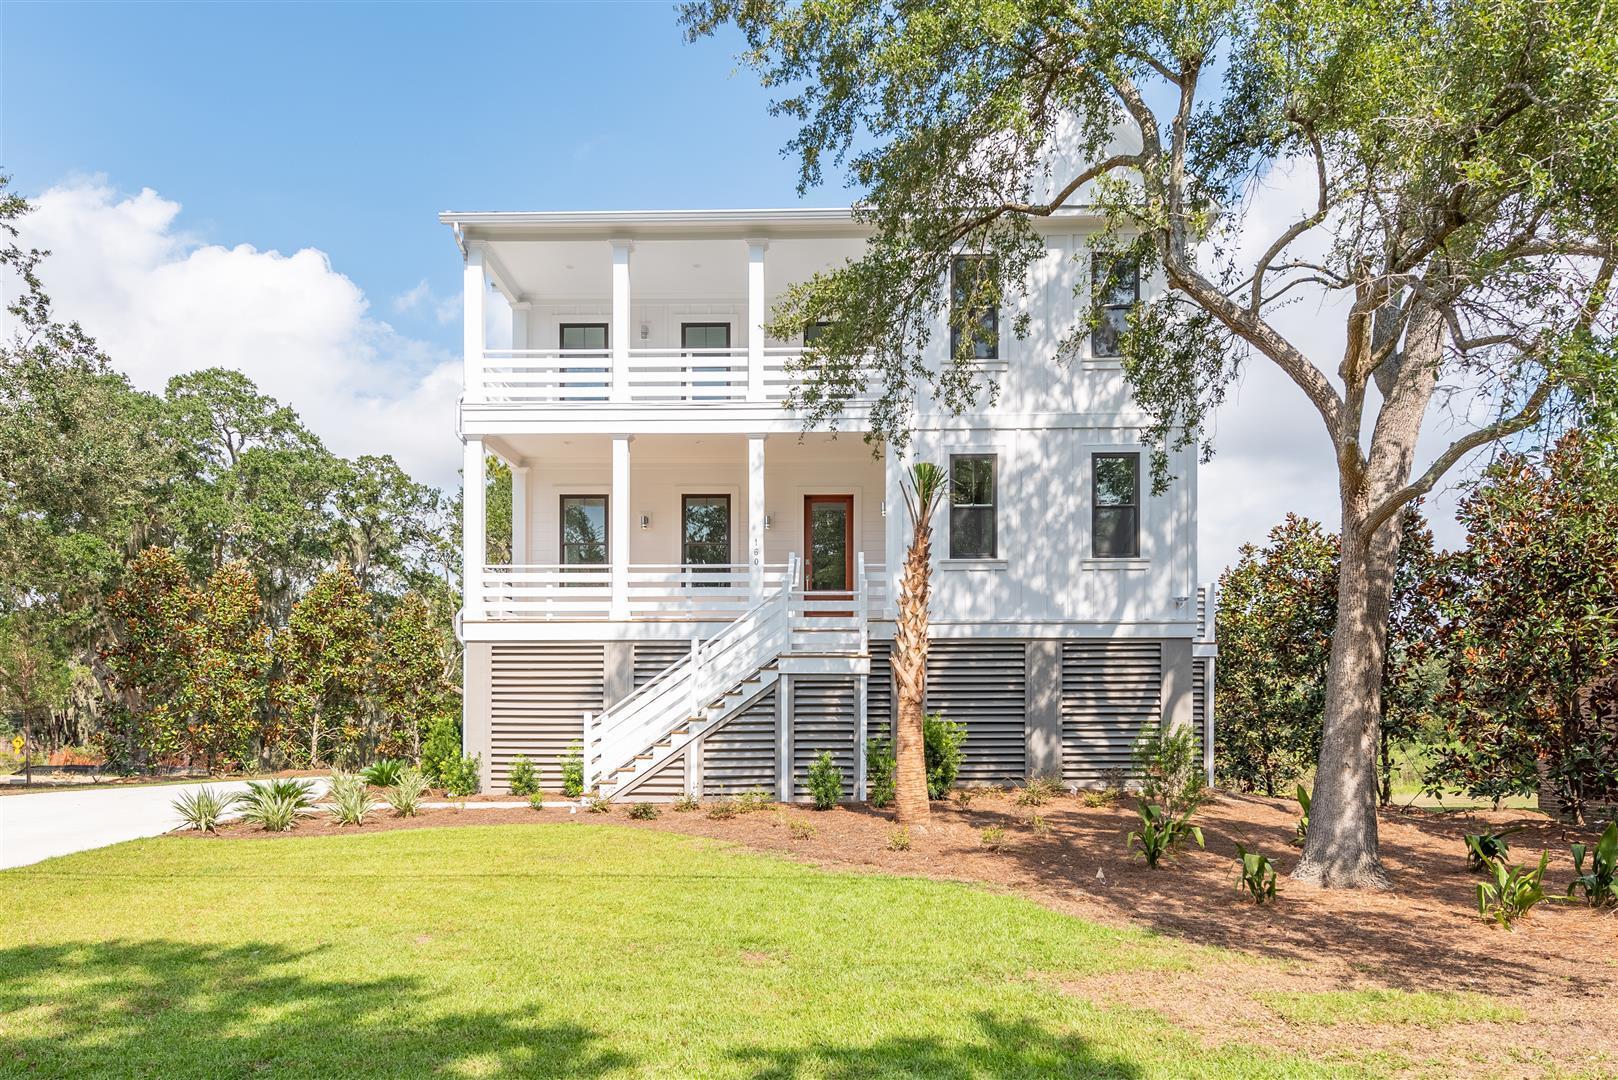 Scanlonville Homes For Sale - 160 5th, Mount Pleasant, SC - 6